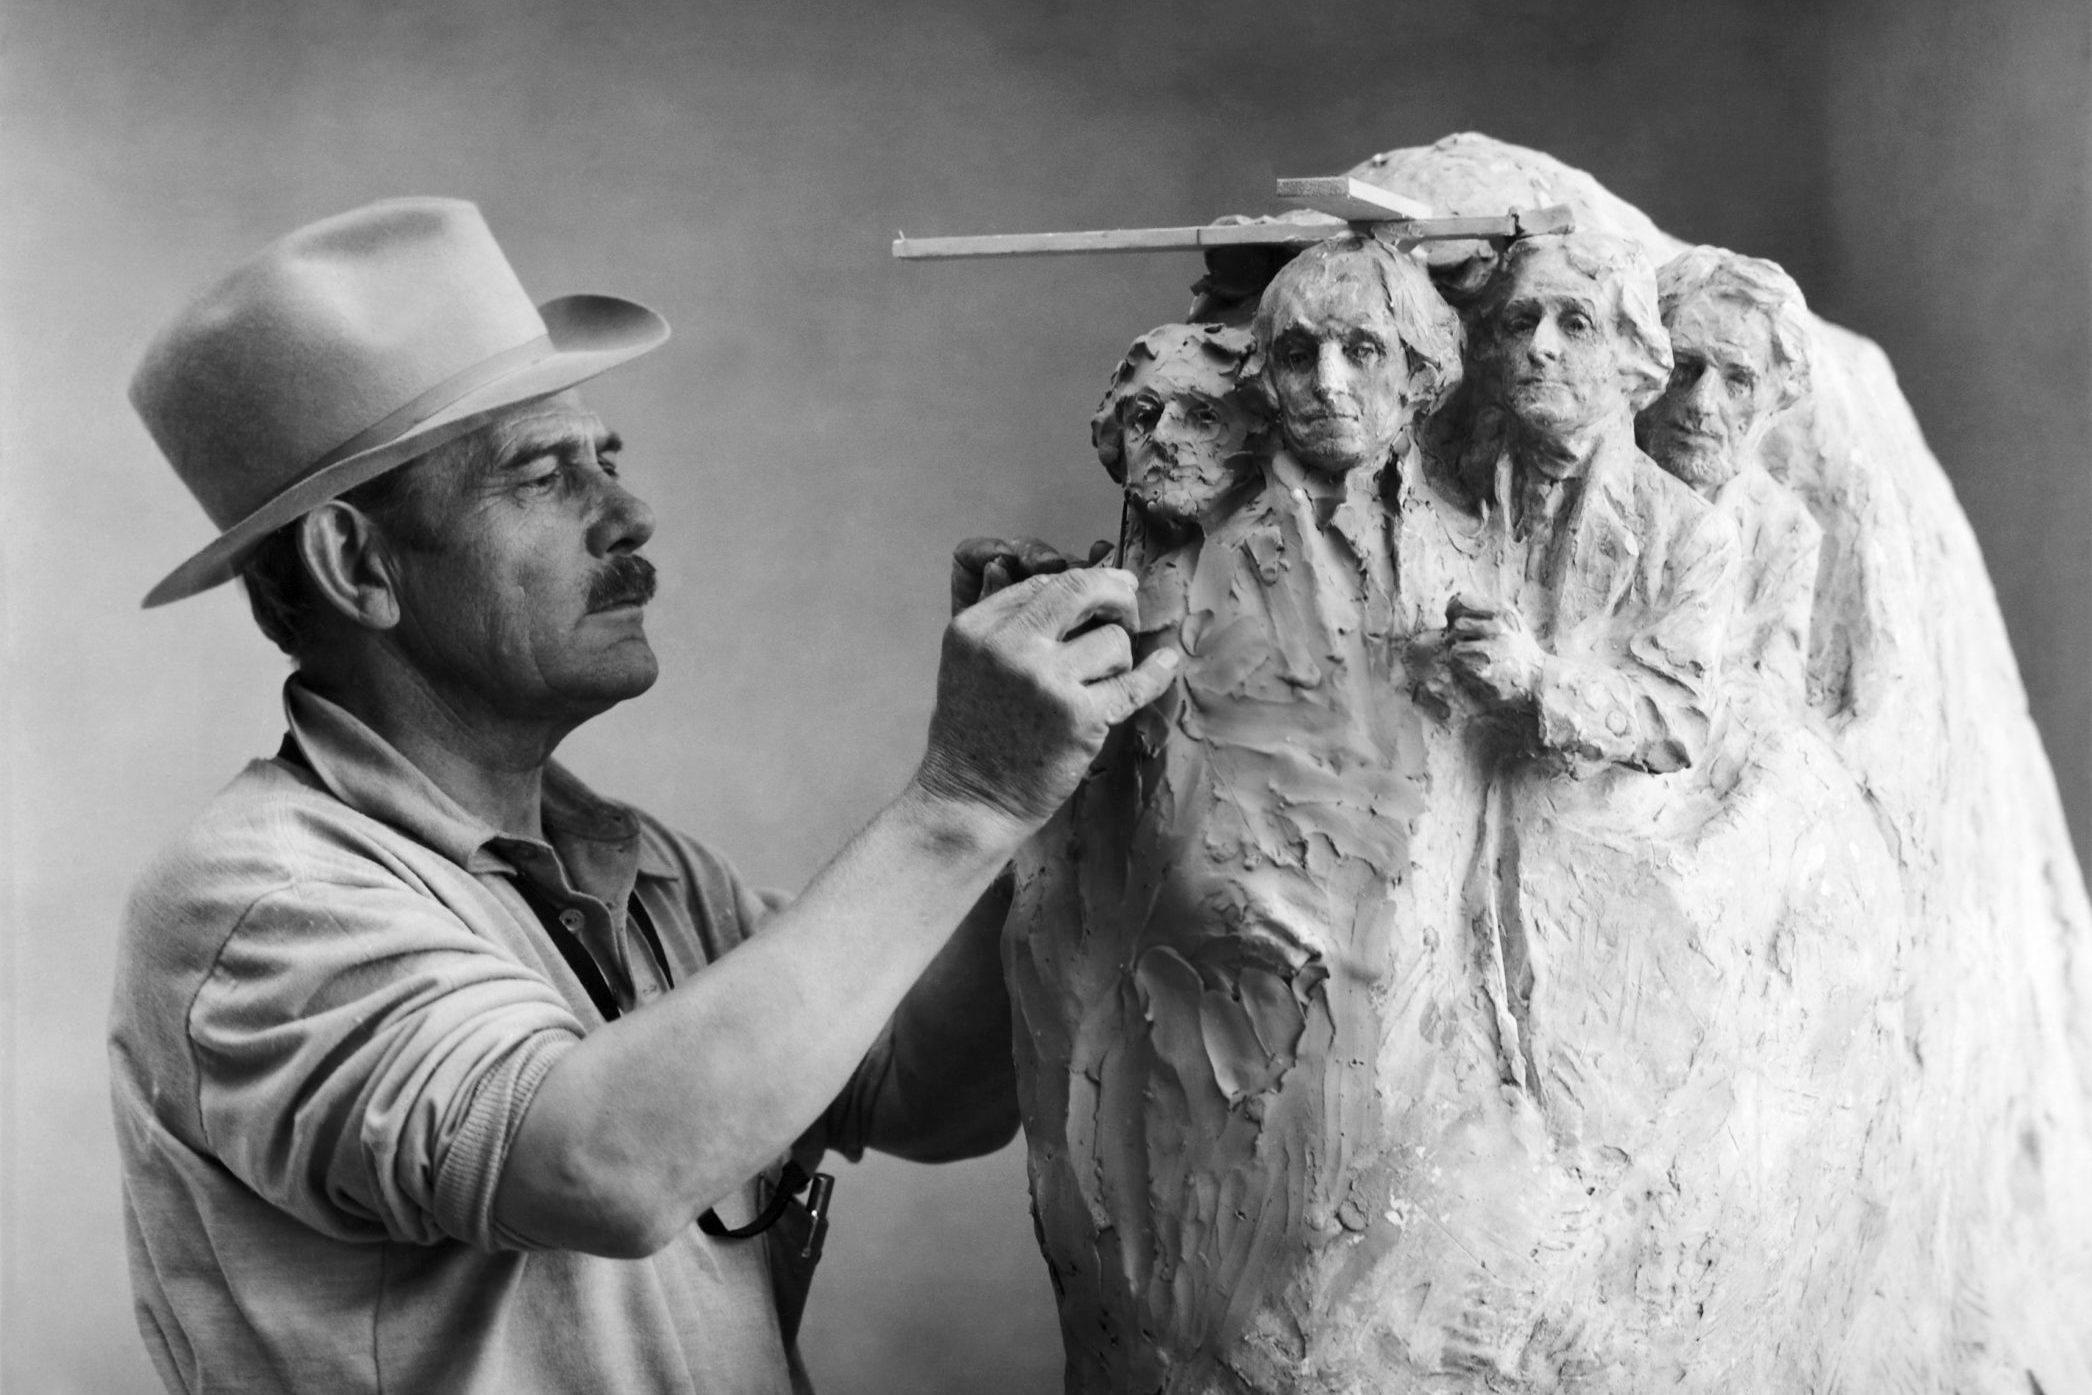 Gutzon Borglum Working on Model